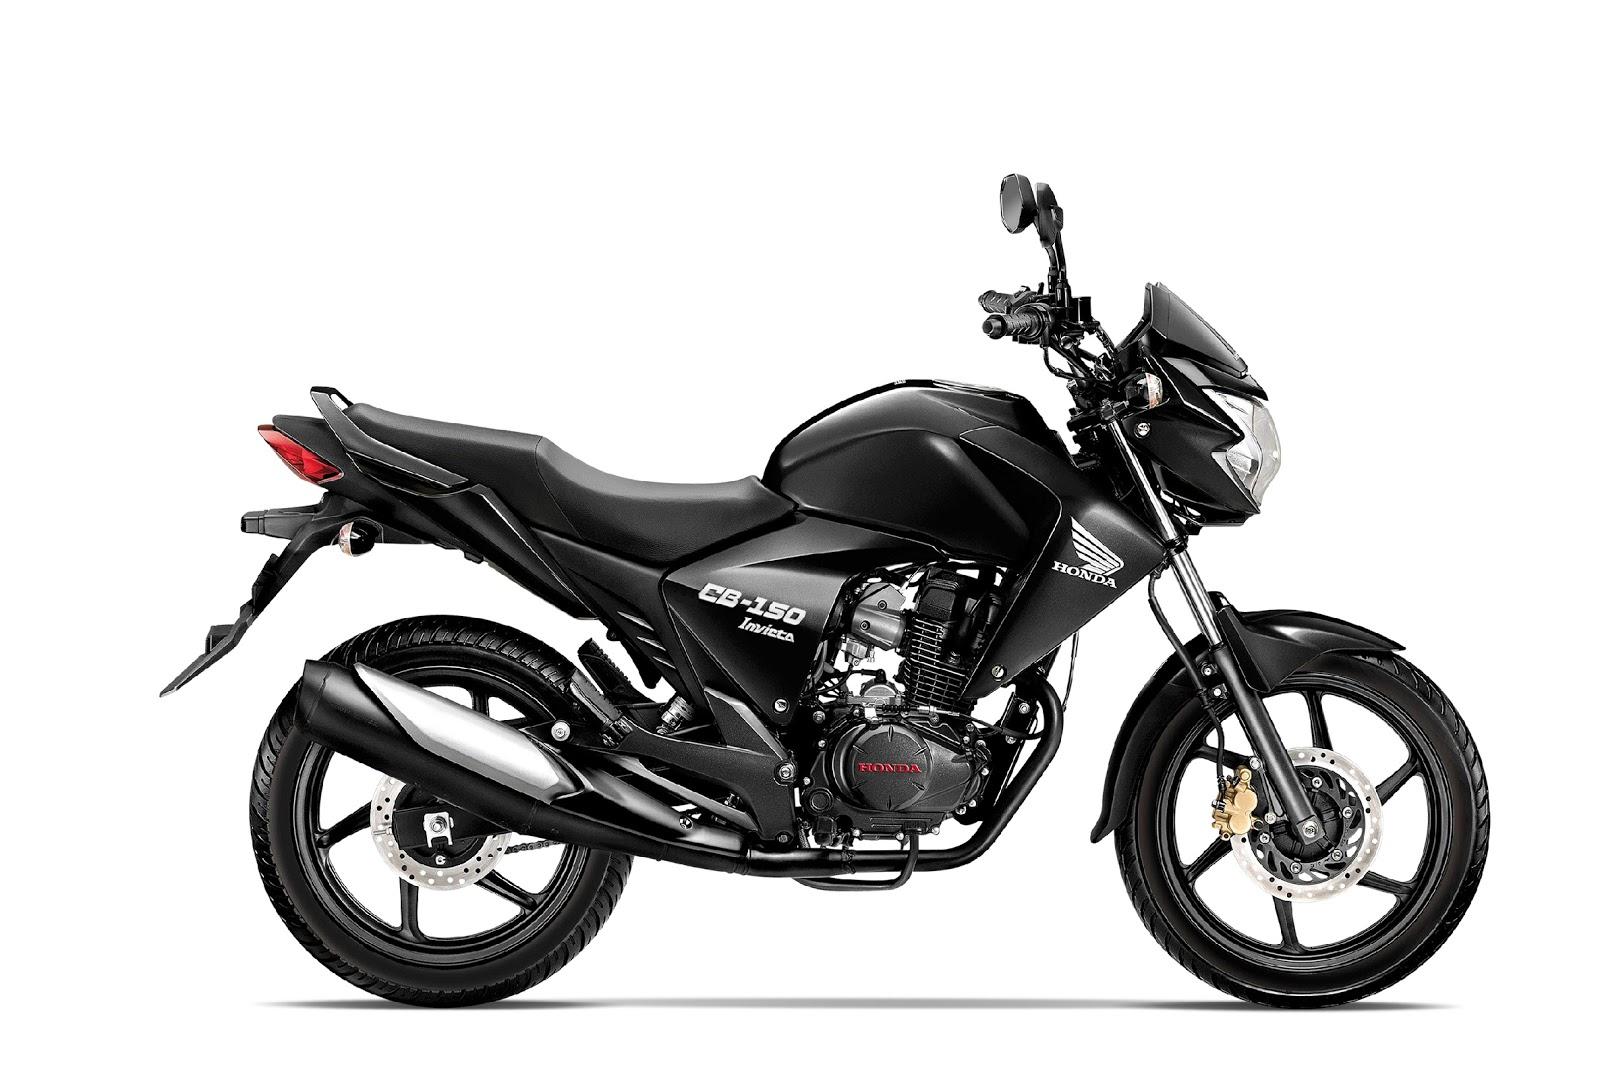 Motos 2013 De Honda Cb 150 Invicta